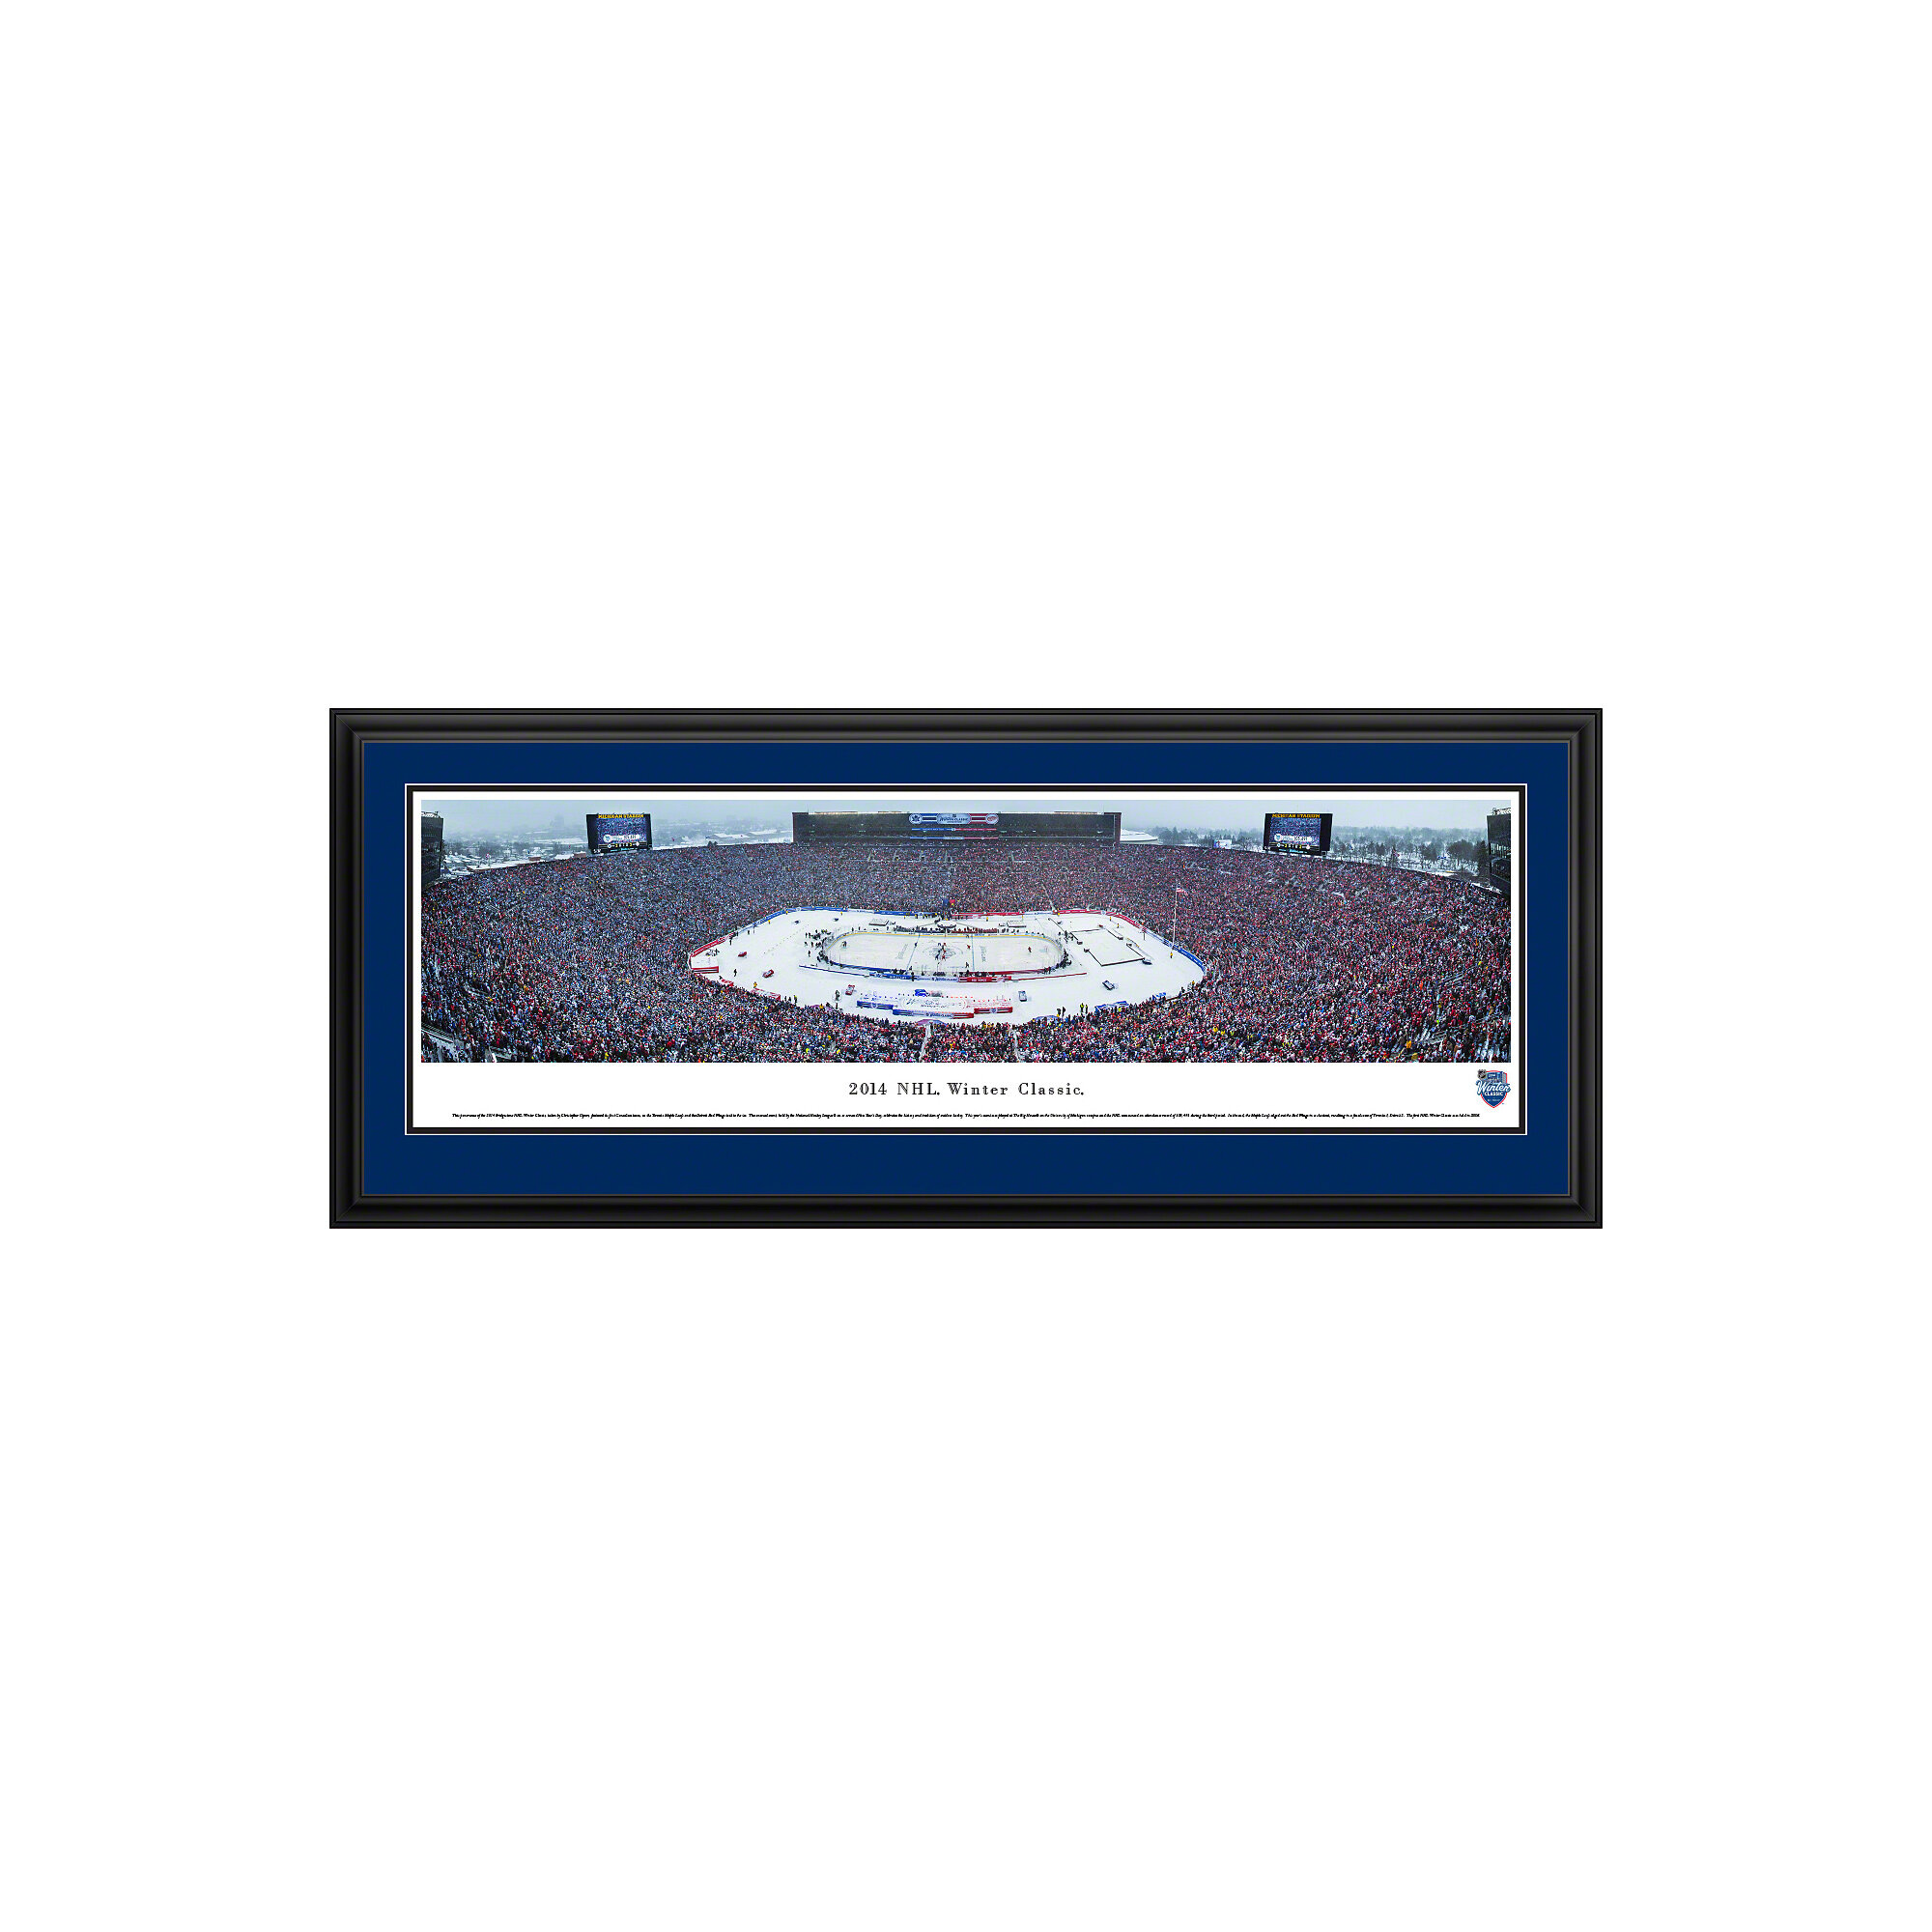 Blakewaypanoramas Nhl Winter Classic Toronto Maple Leafs By Christopher Gjevre Framed Photographic Print Wayfair